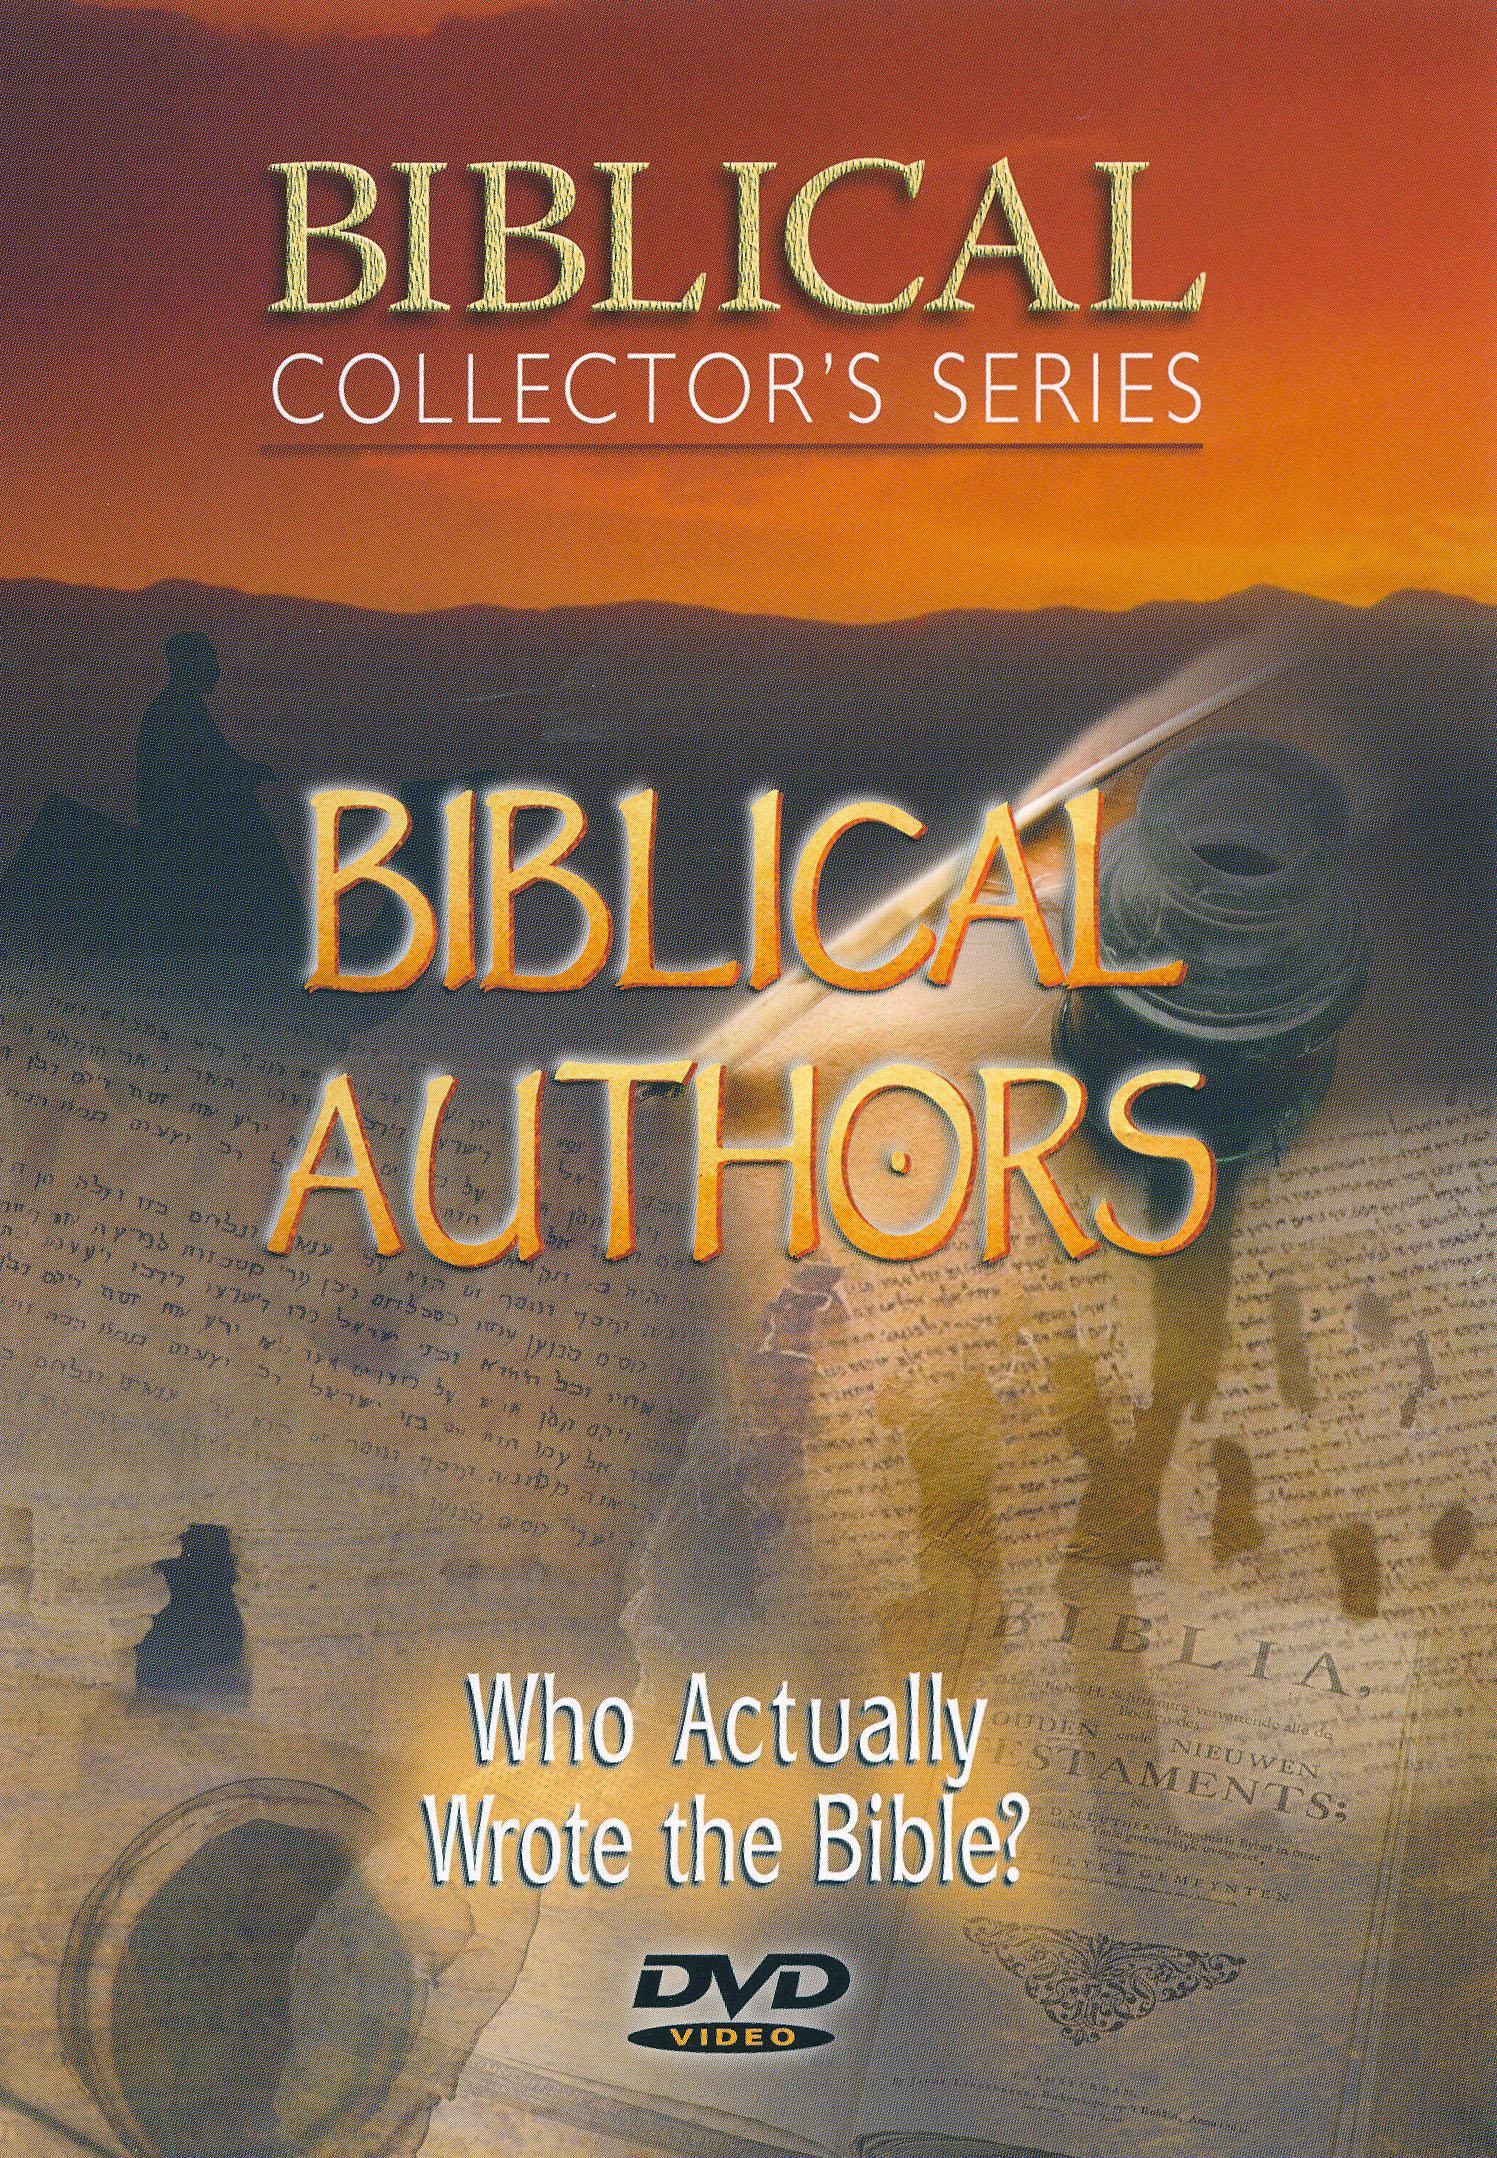 Biblical Collector's Series: Biblical Authors